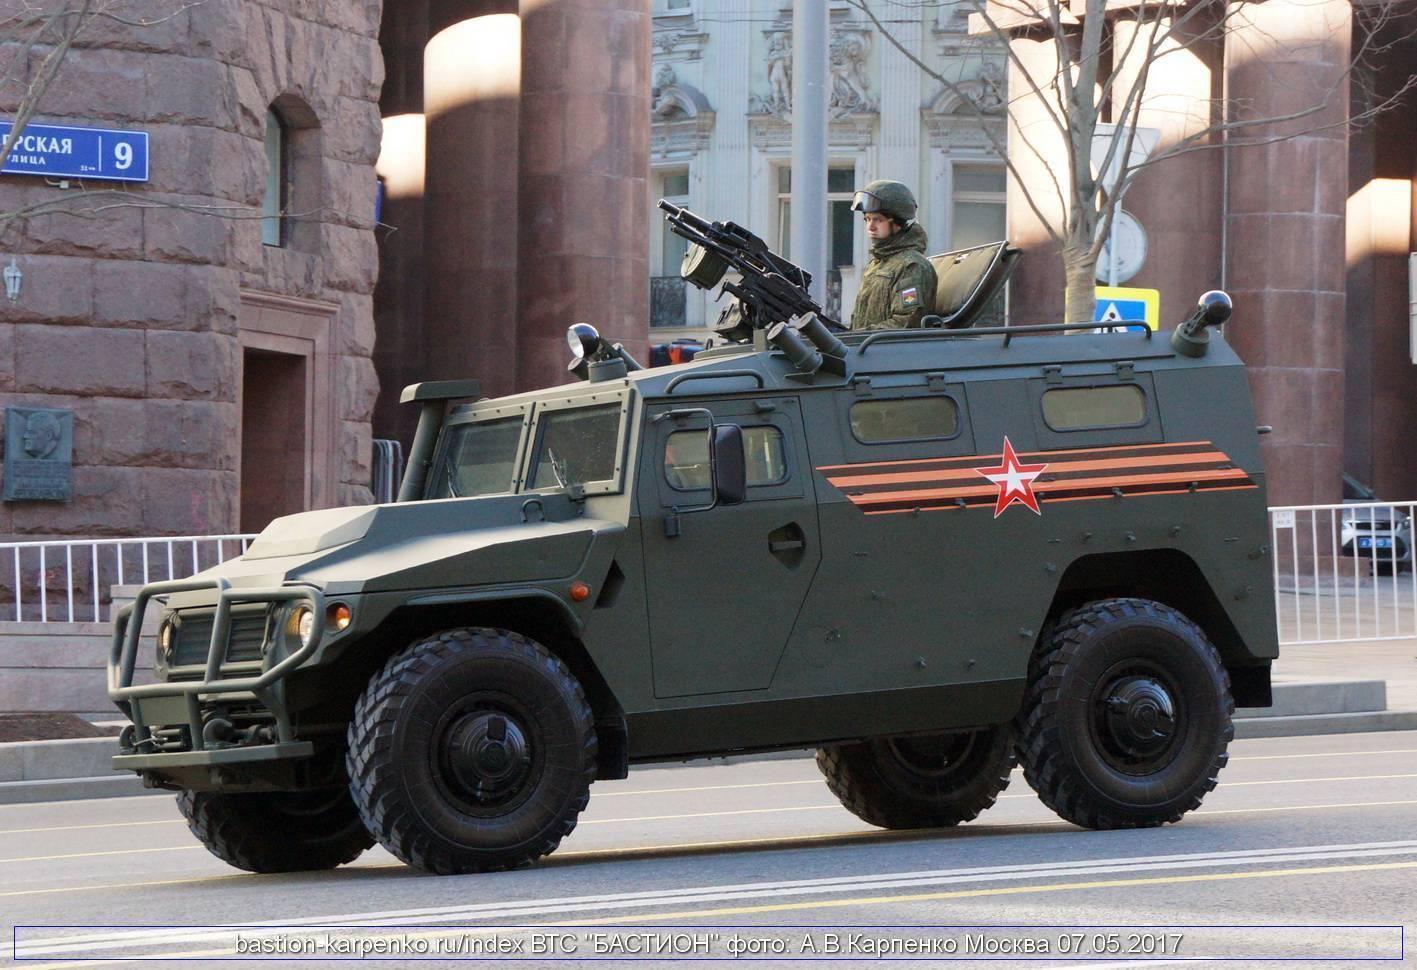 Бронеавтомобиль Тигр – случайный проект армии РФ